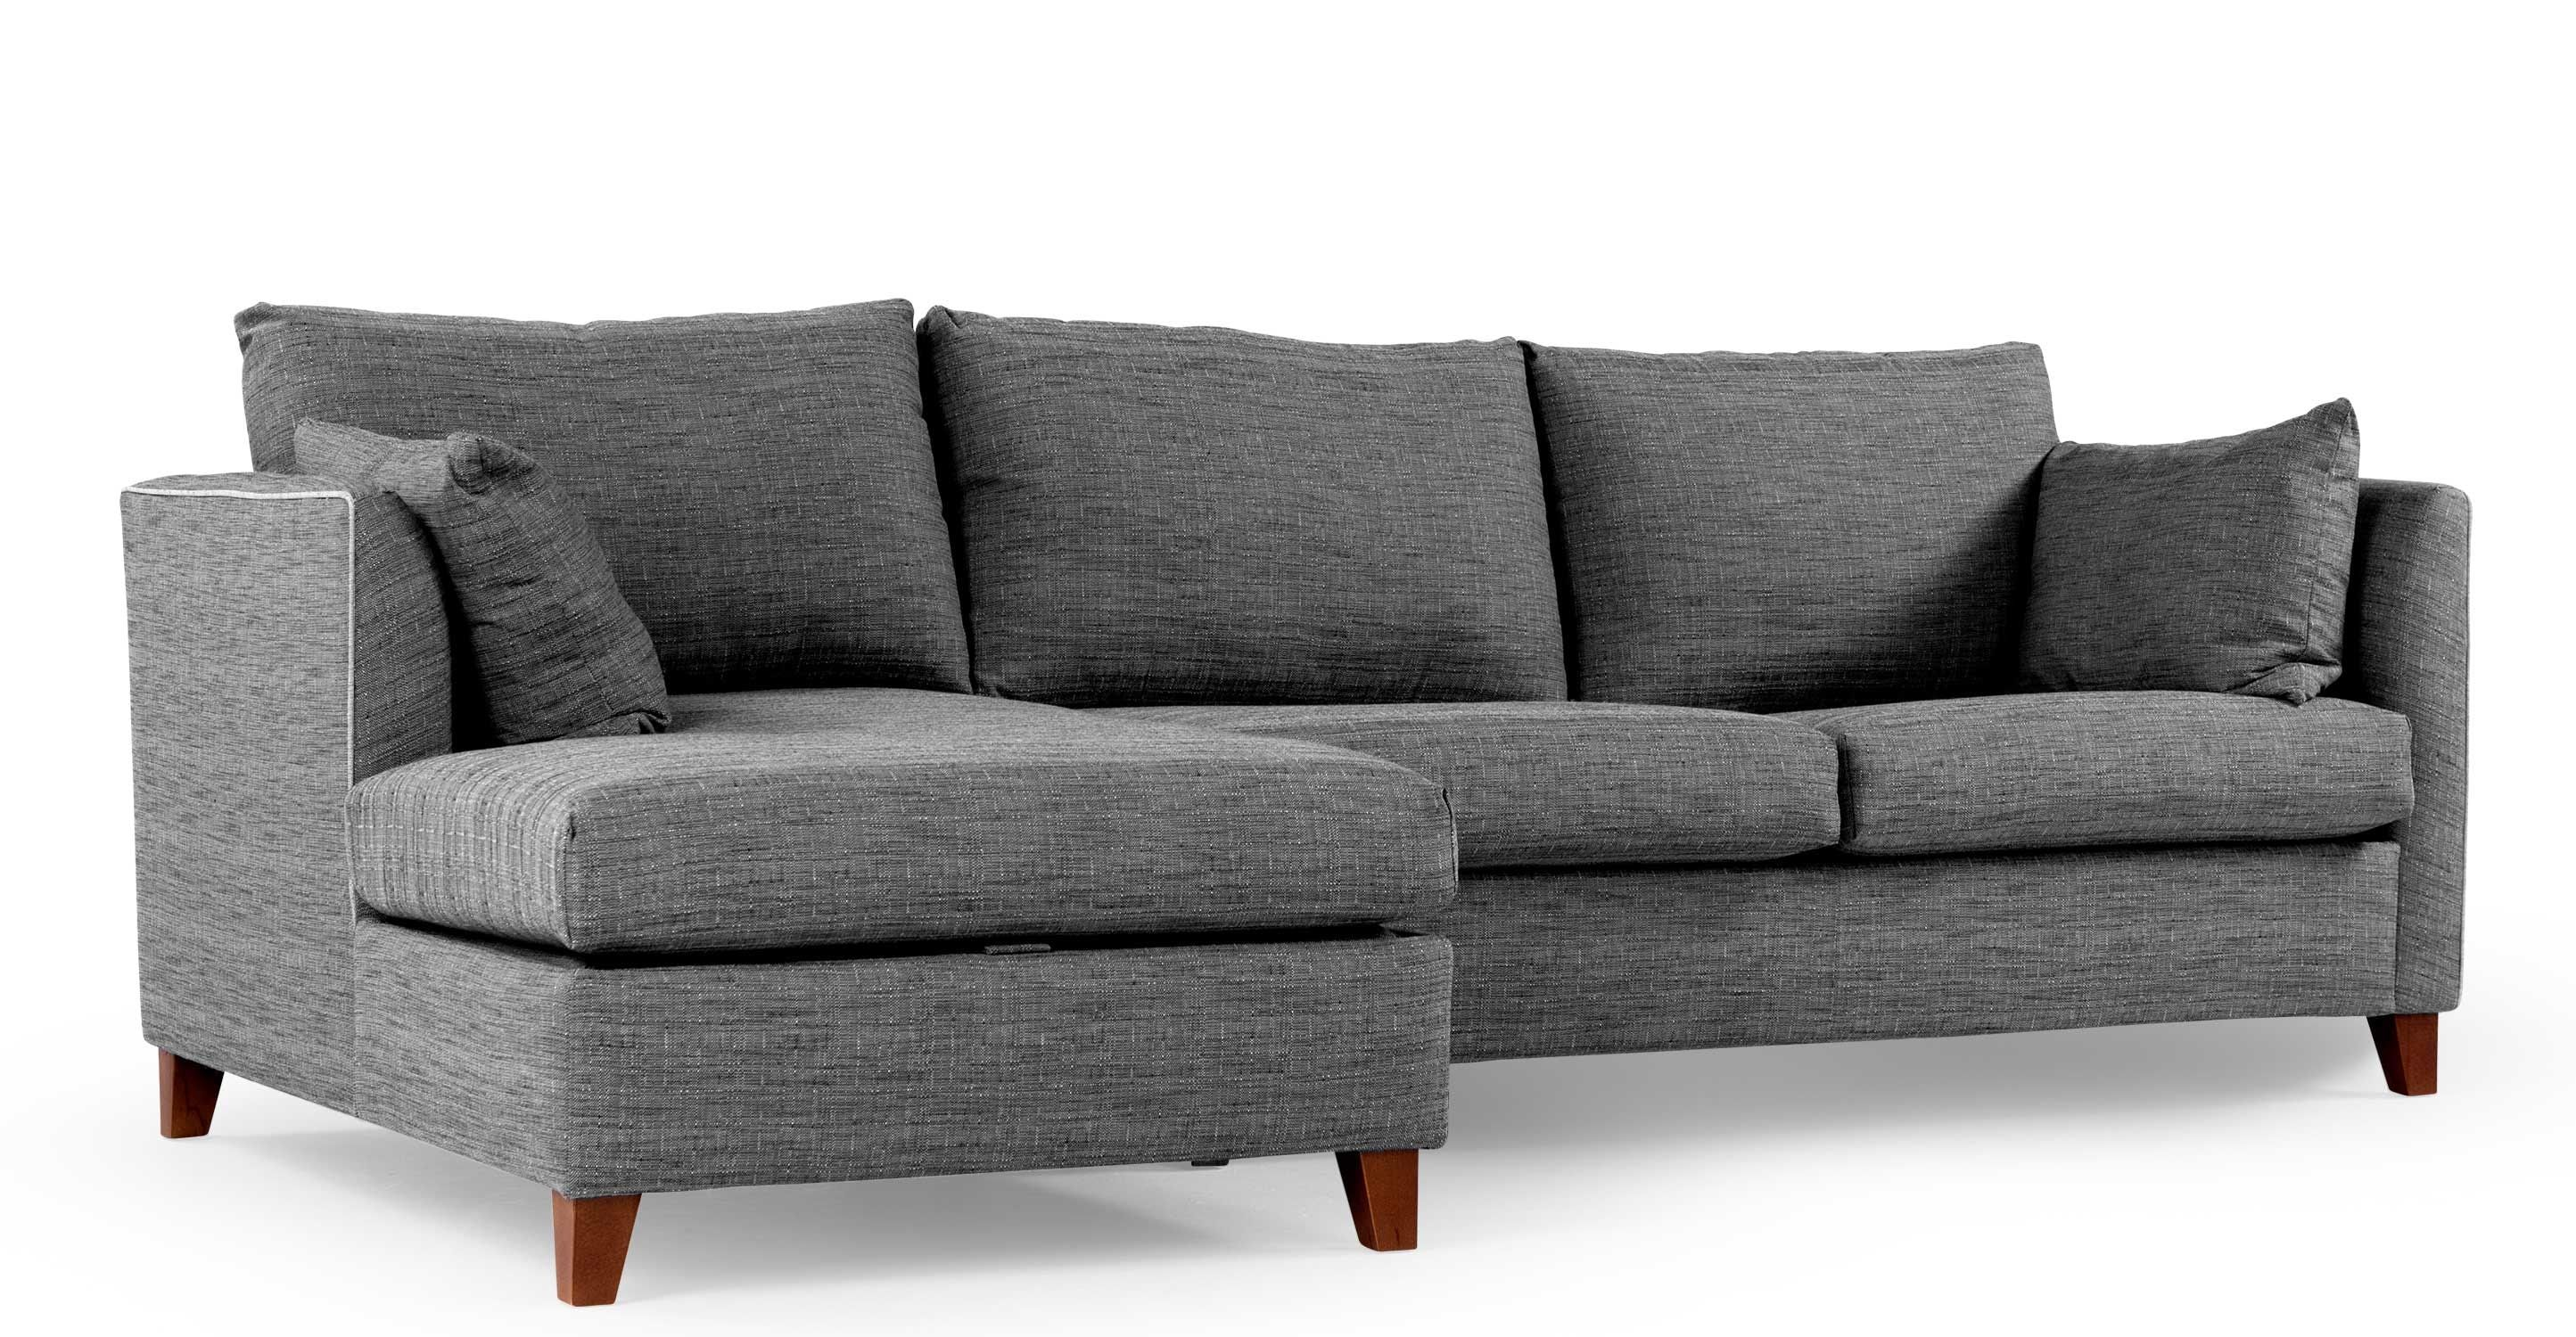 Bari Corner Storage Sofabed Left Hand Facing Malva Graphite Made